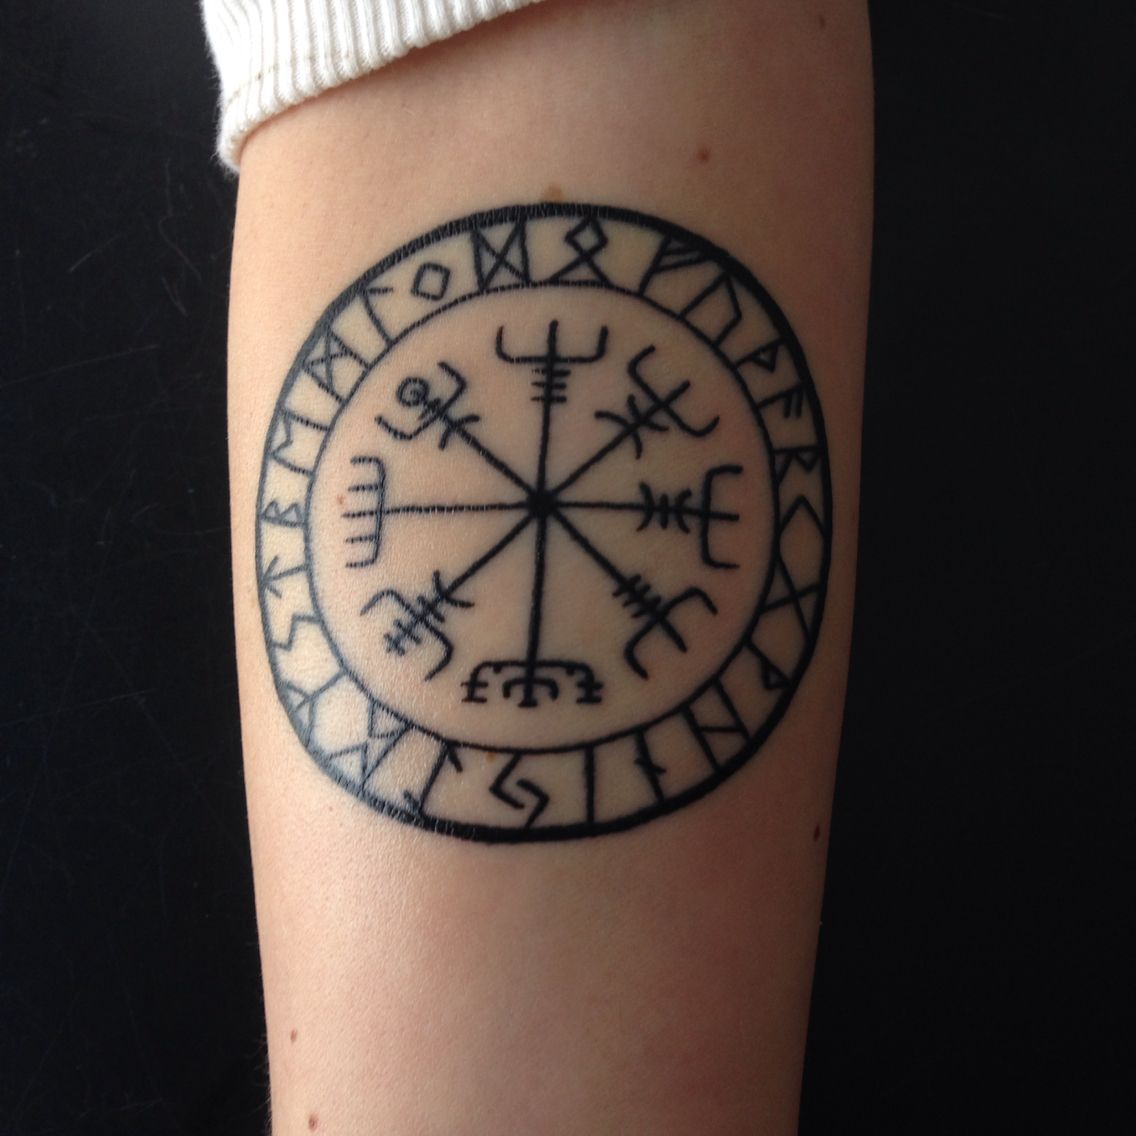 Nordic Compass Tattoo Done By Tyler Kolvenbach From Hudson Valley Tattoos In Ny Tatouage Viking Tatouage Tatoo